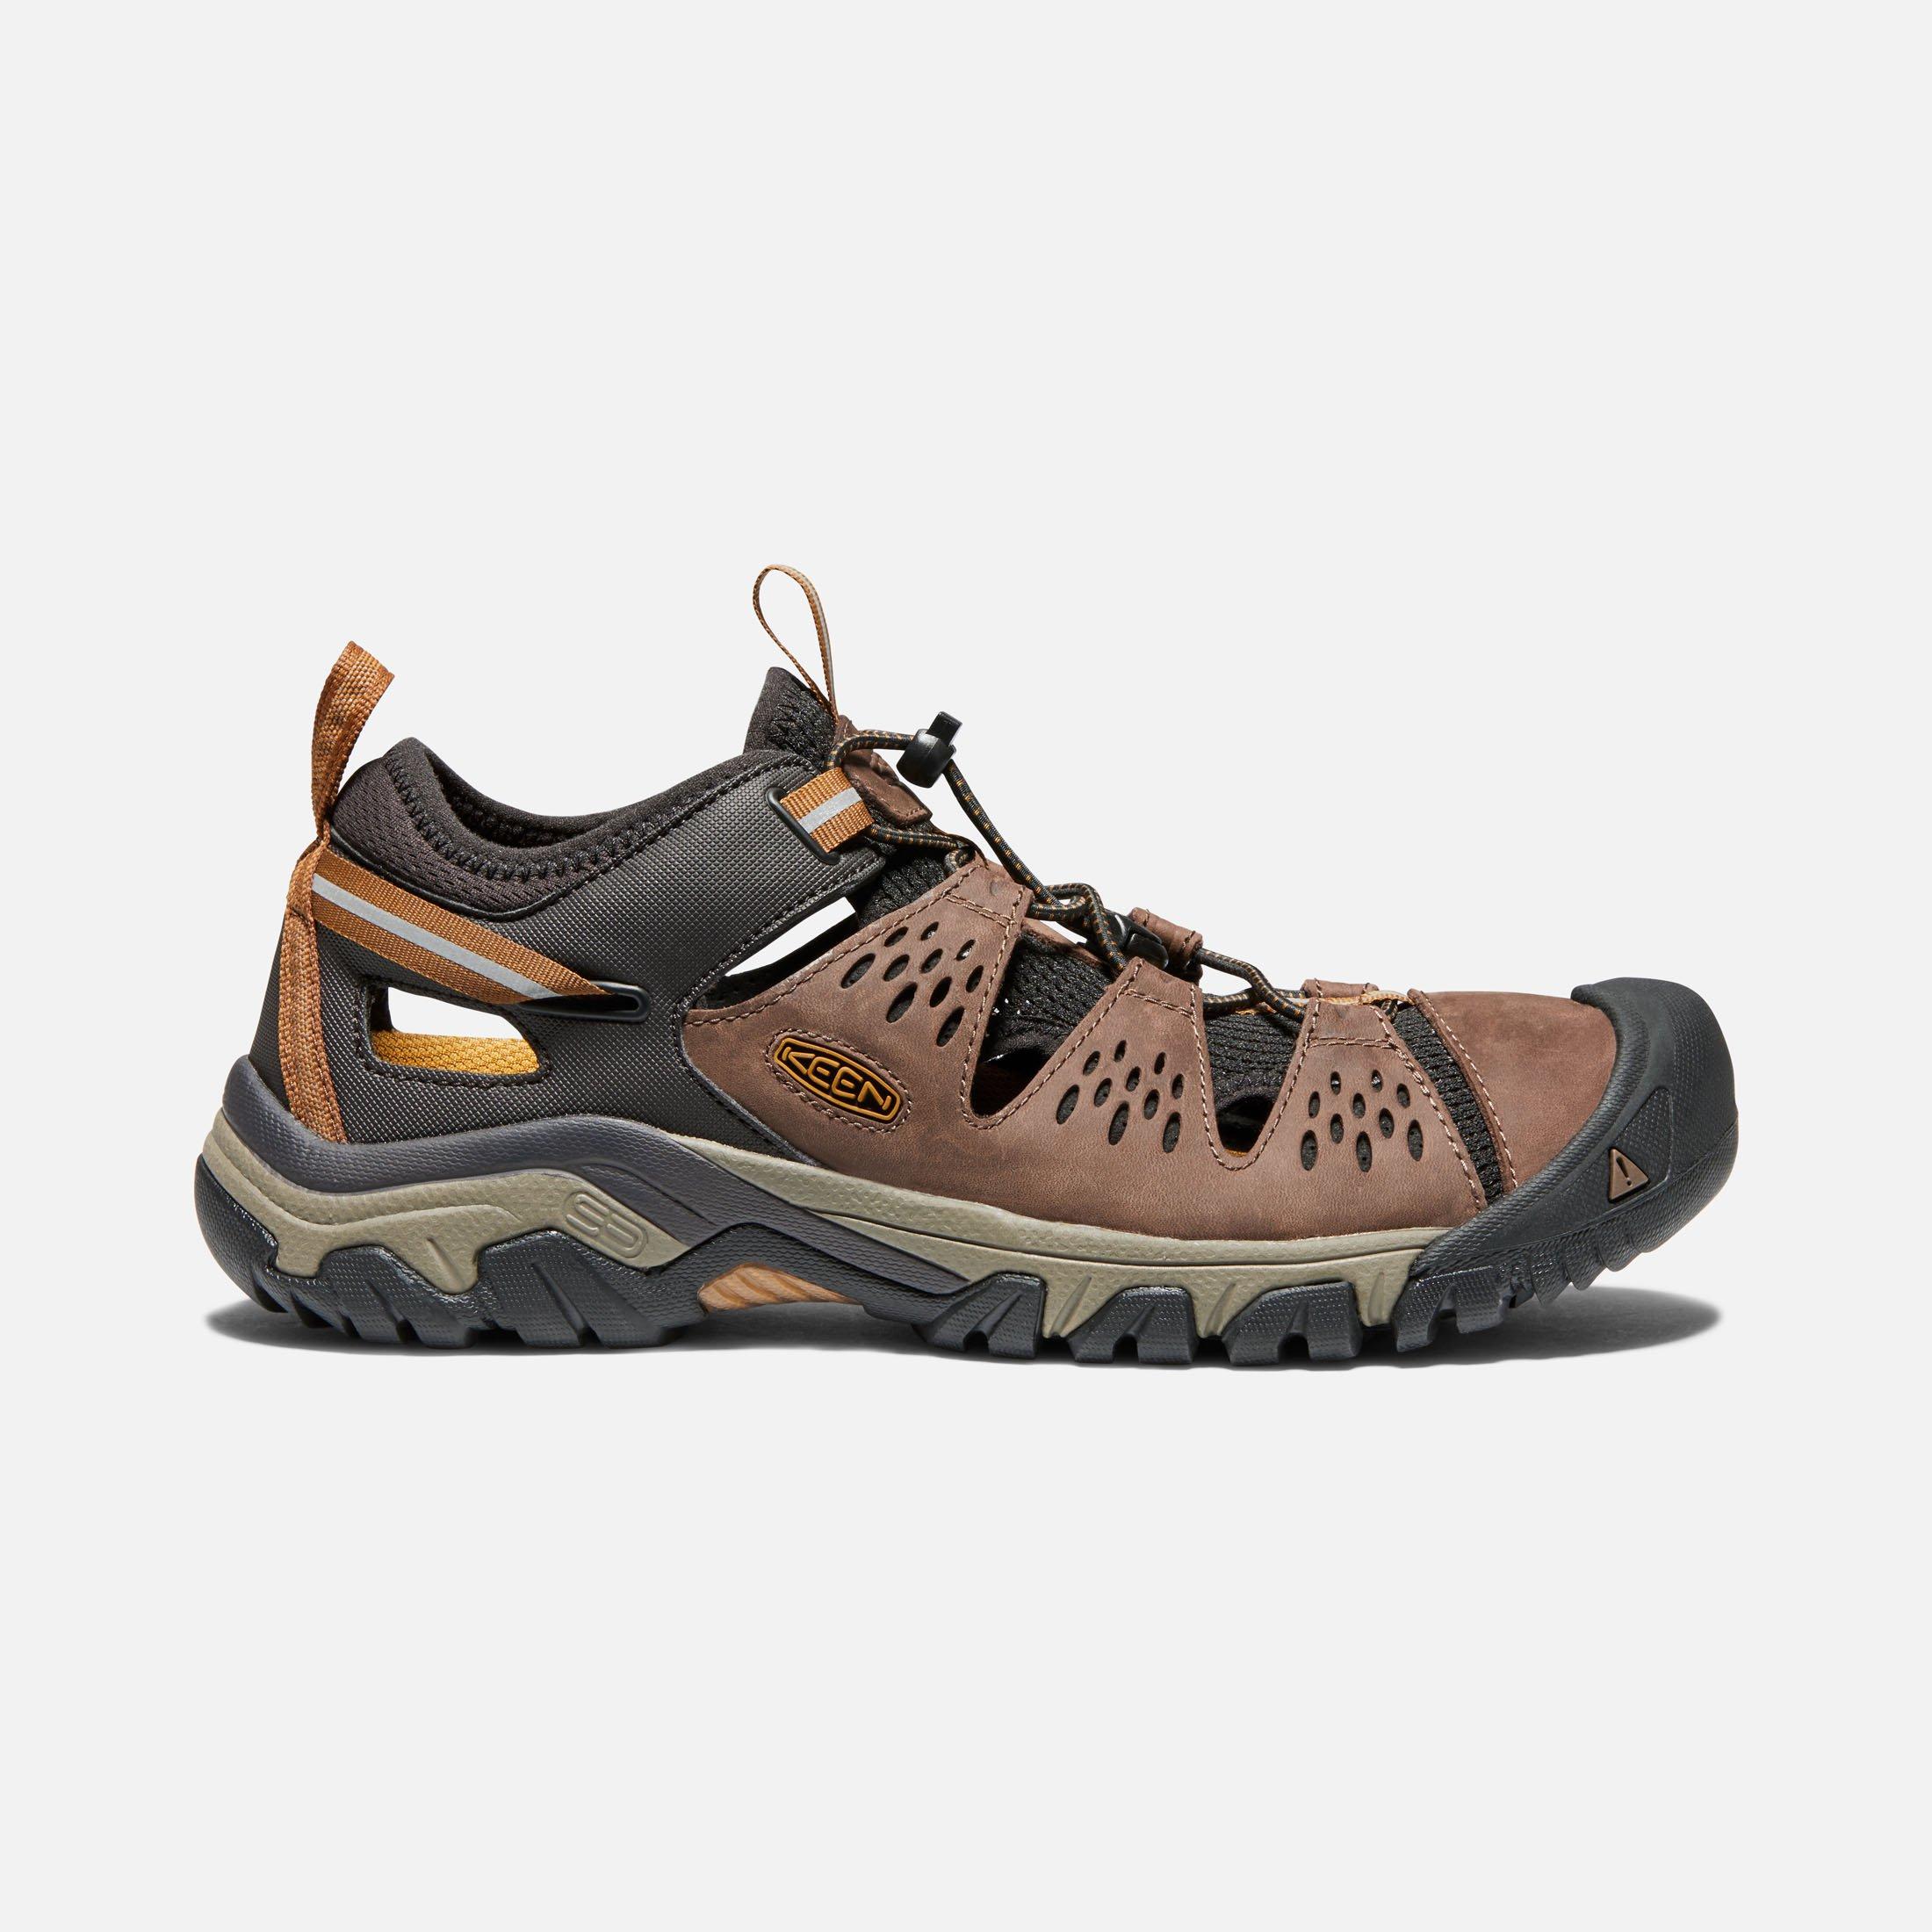 4a89f7a33e Keen Men's Arroyo III Sandals Size 11.5, In Cuban/Golden Brown in ...